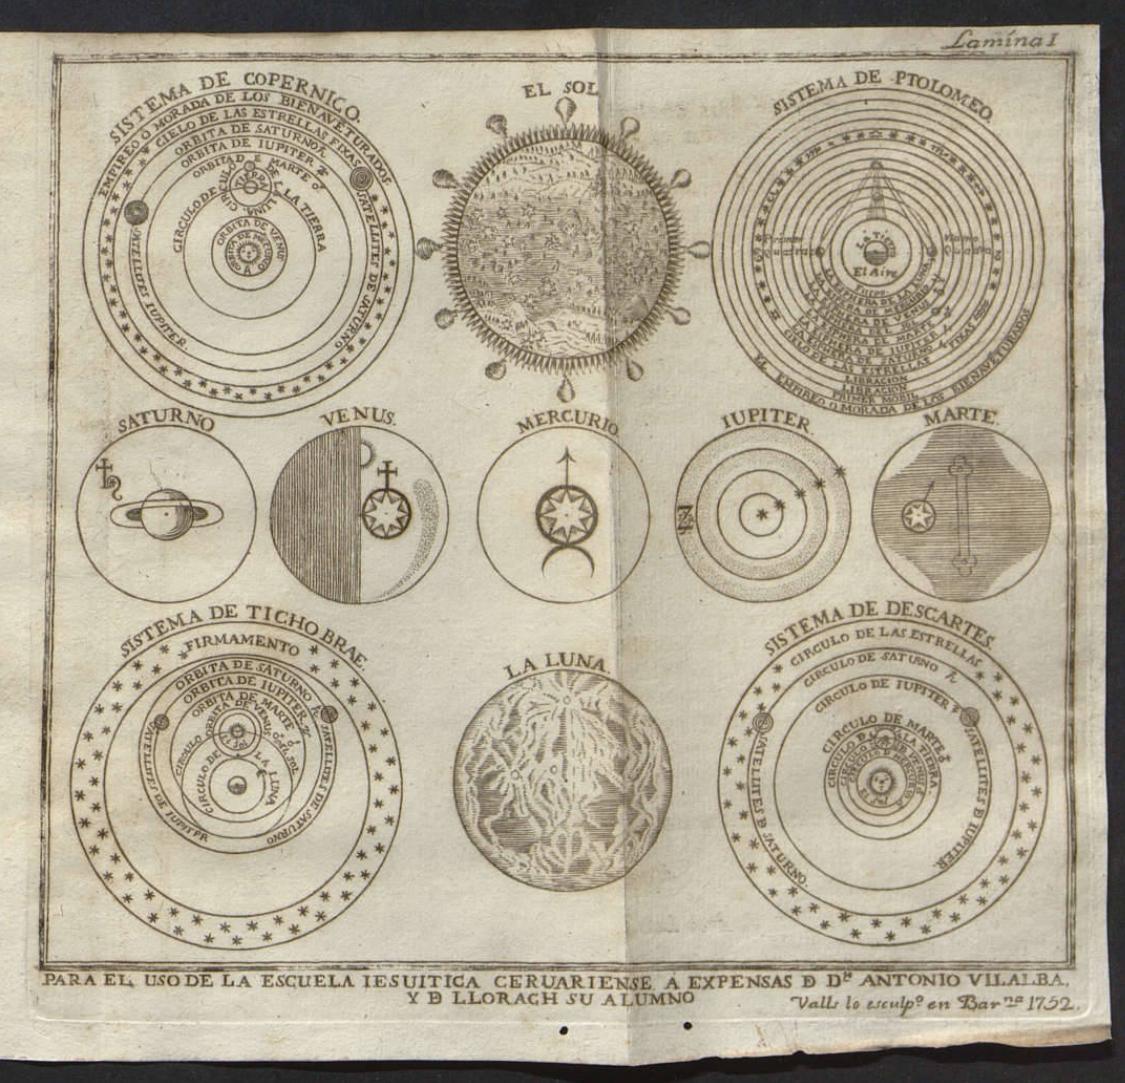 Je bekijkt nu Jesuiticae philosophiae theses – 1753 'GEMISTE' KANS